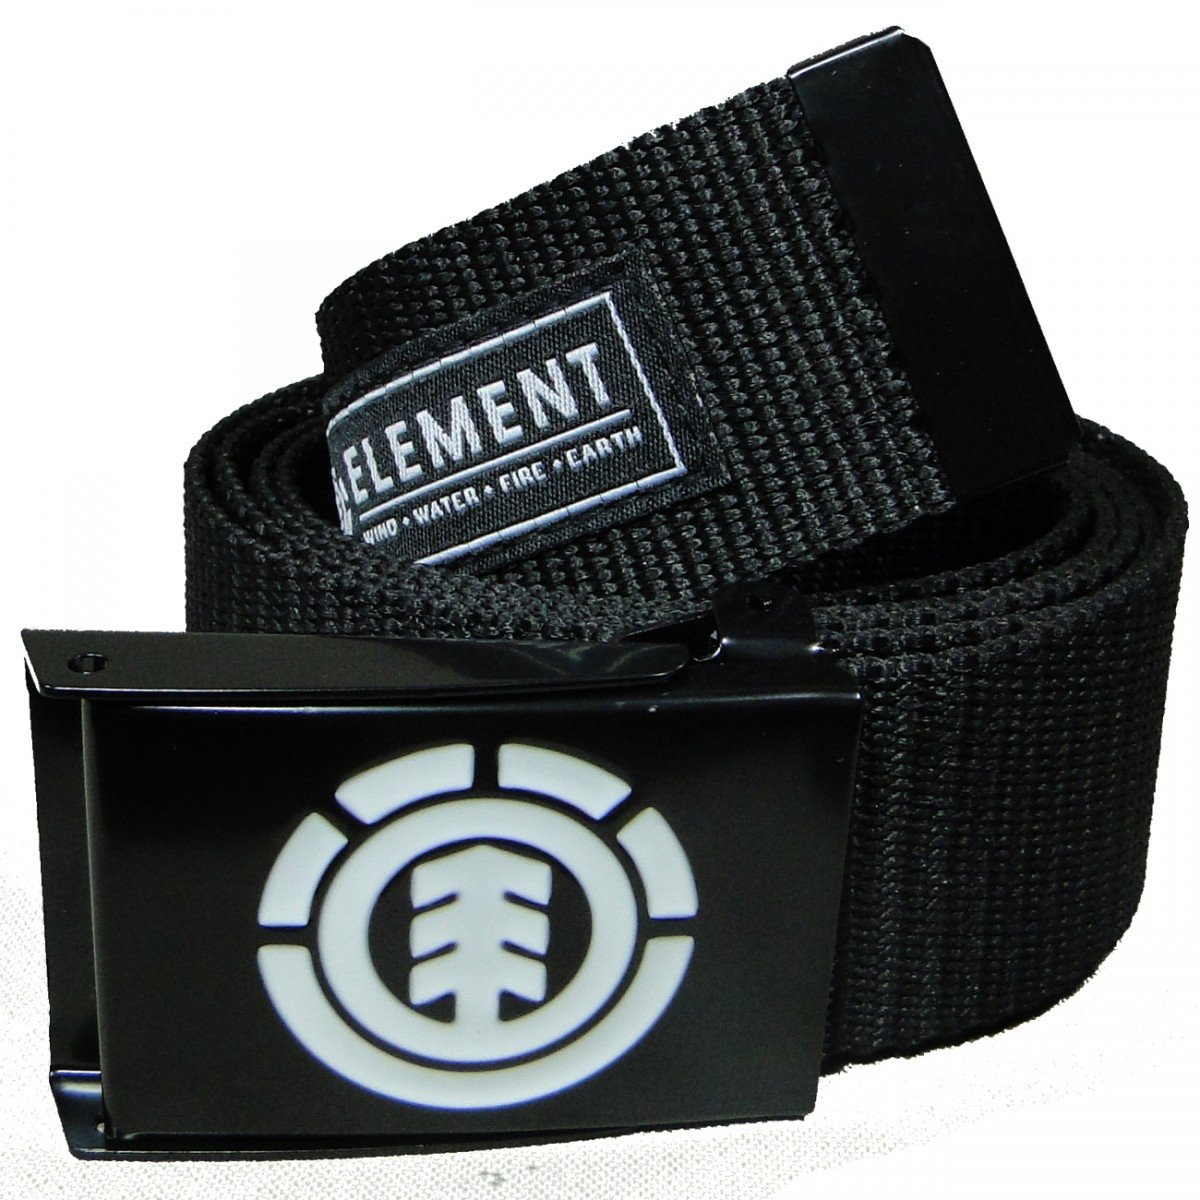 Cinto Element Beyond - Compre Agora  d1a9e429544